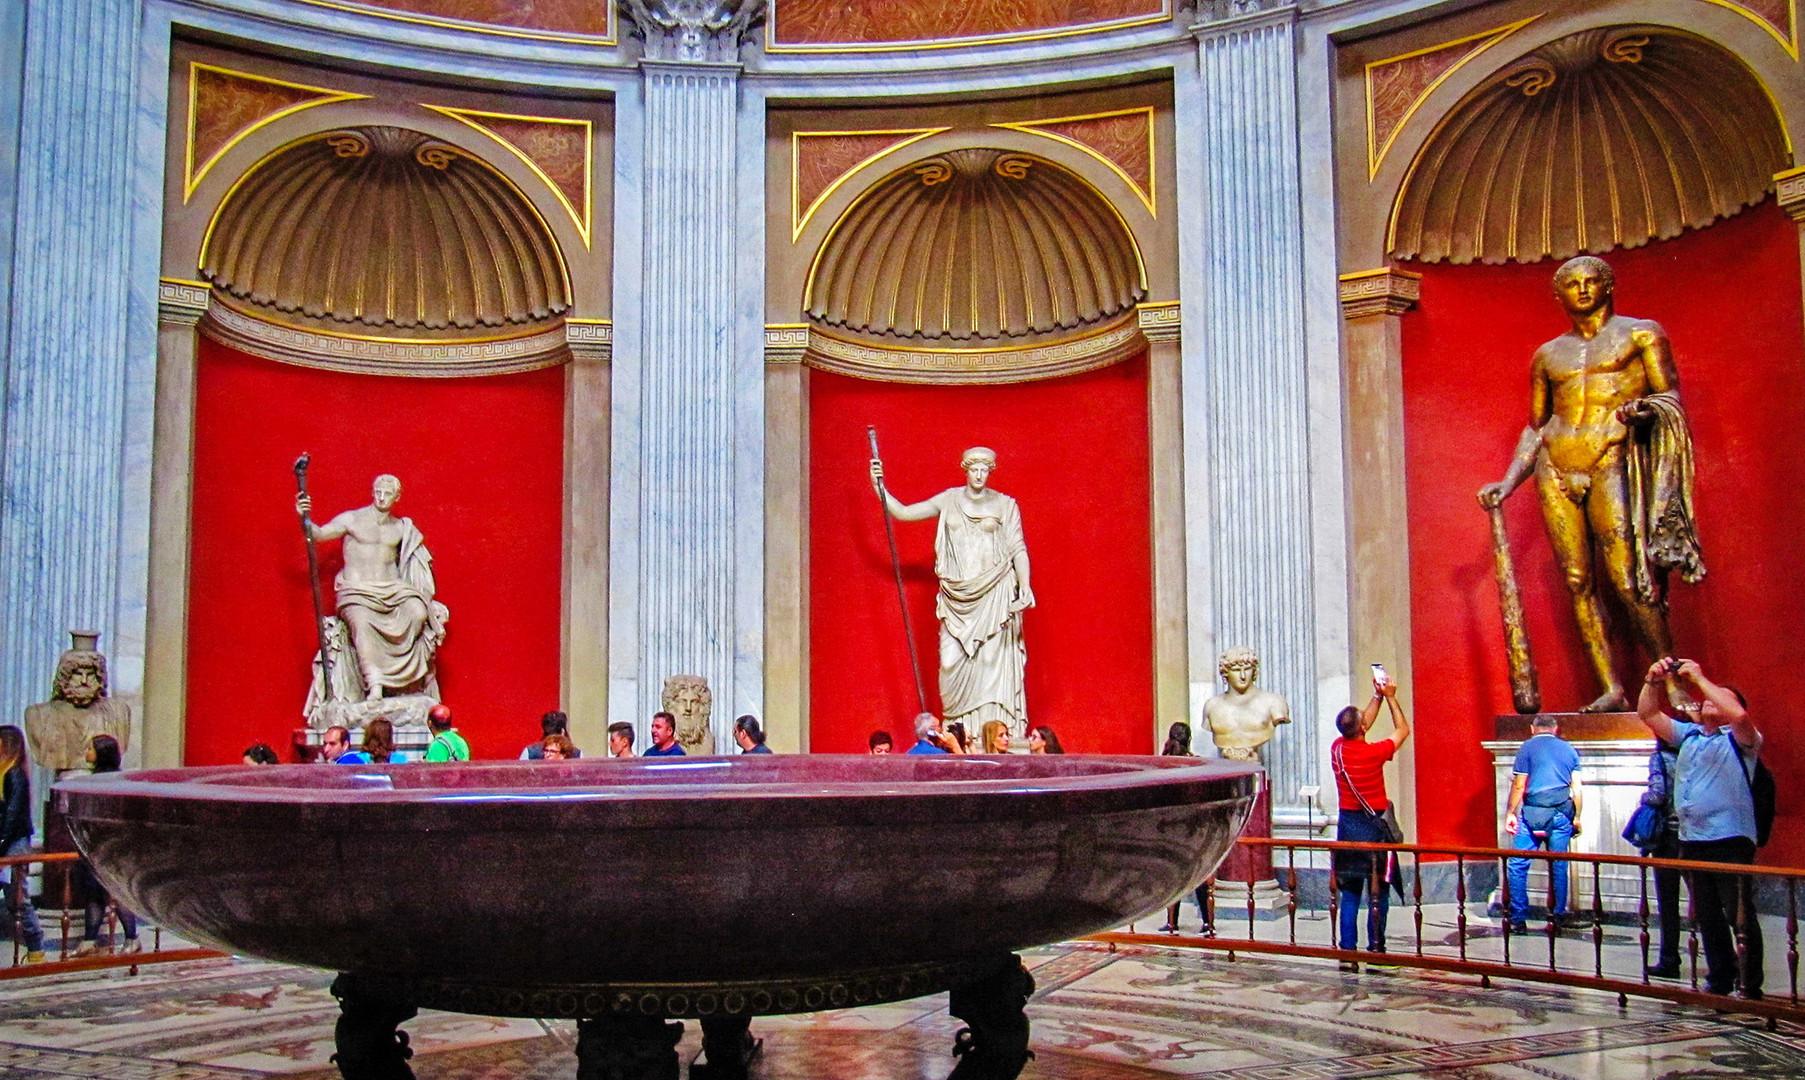 Музей Пио-Клементино в Ватикане